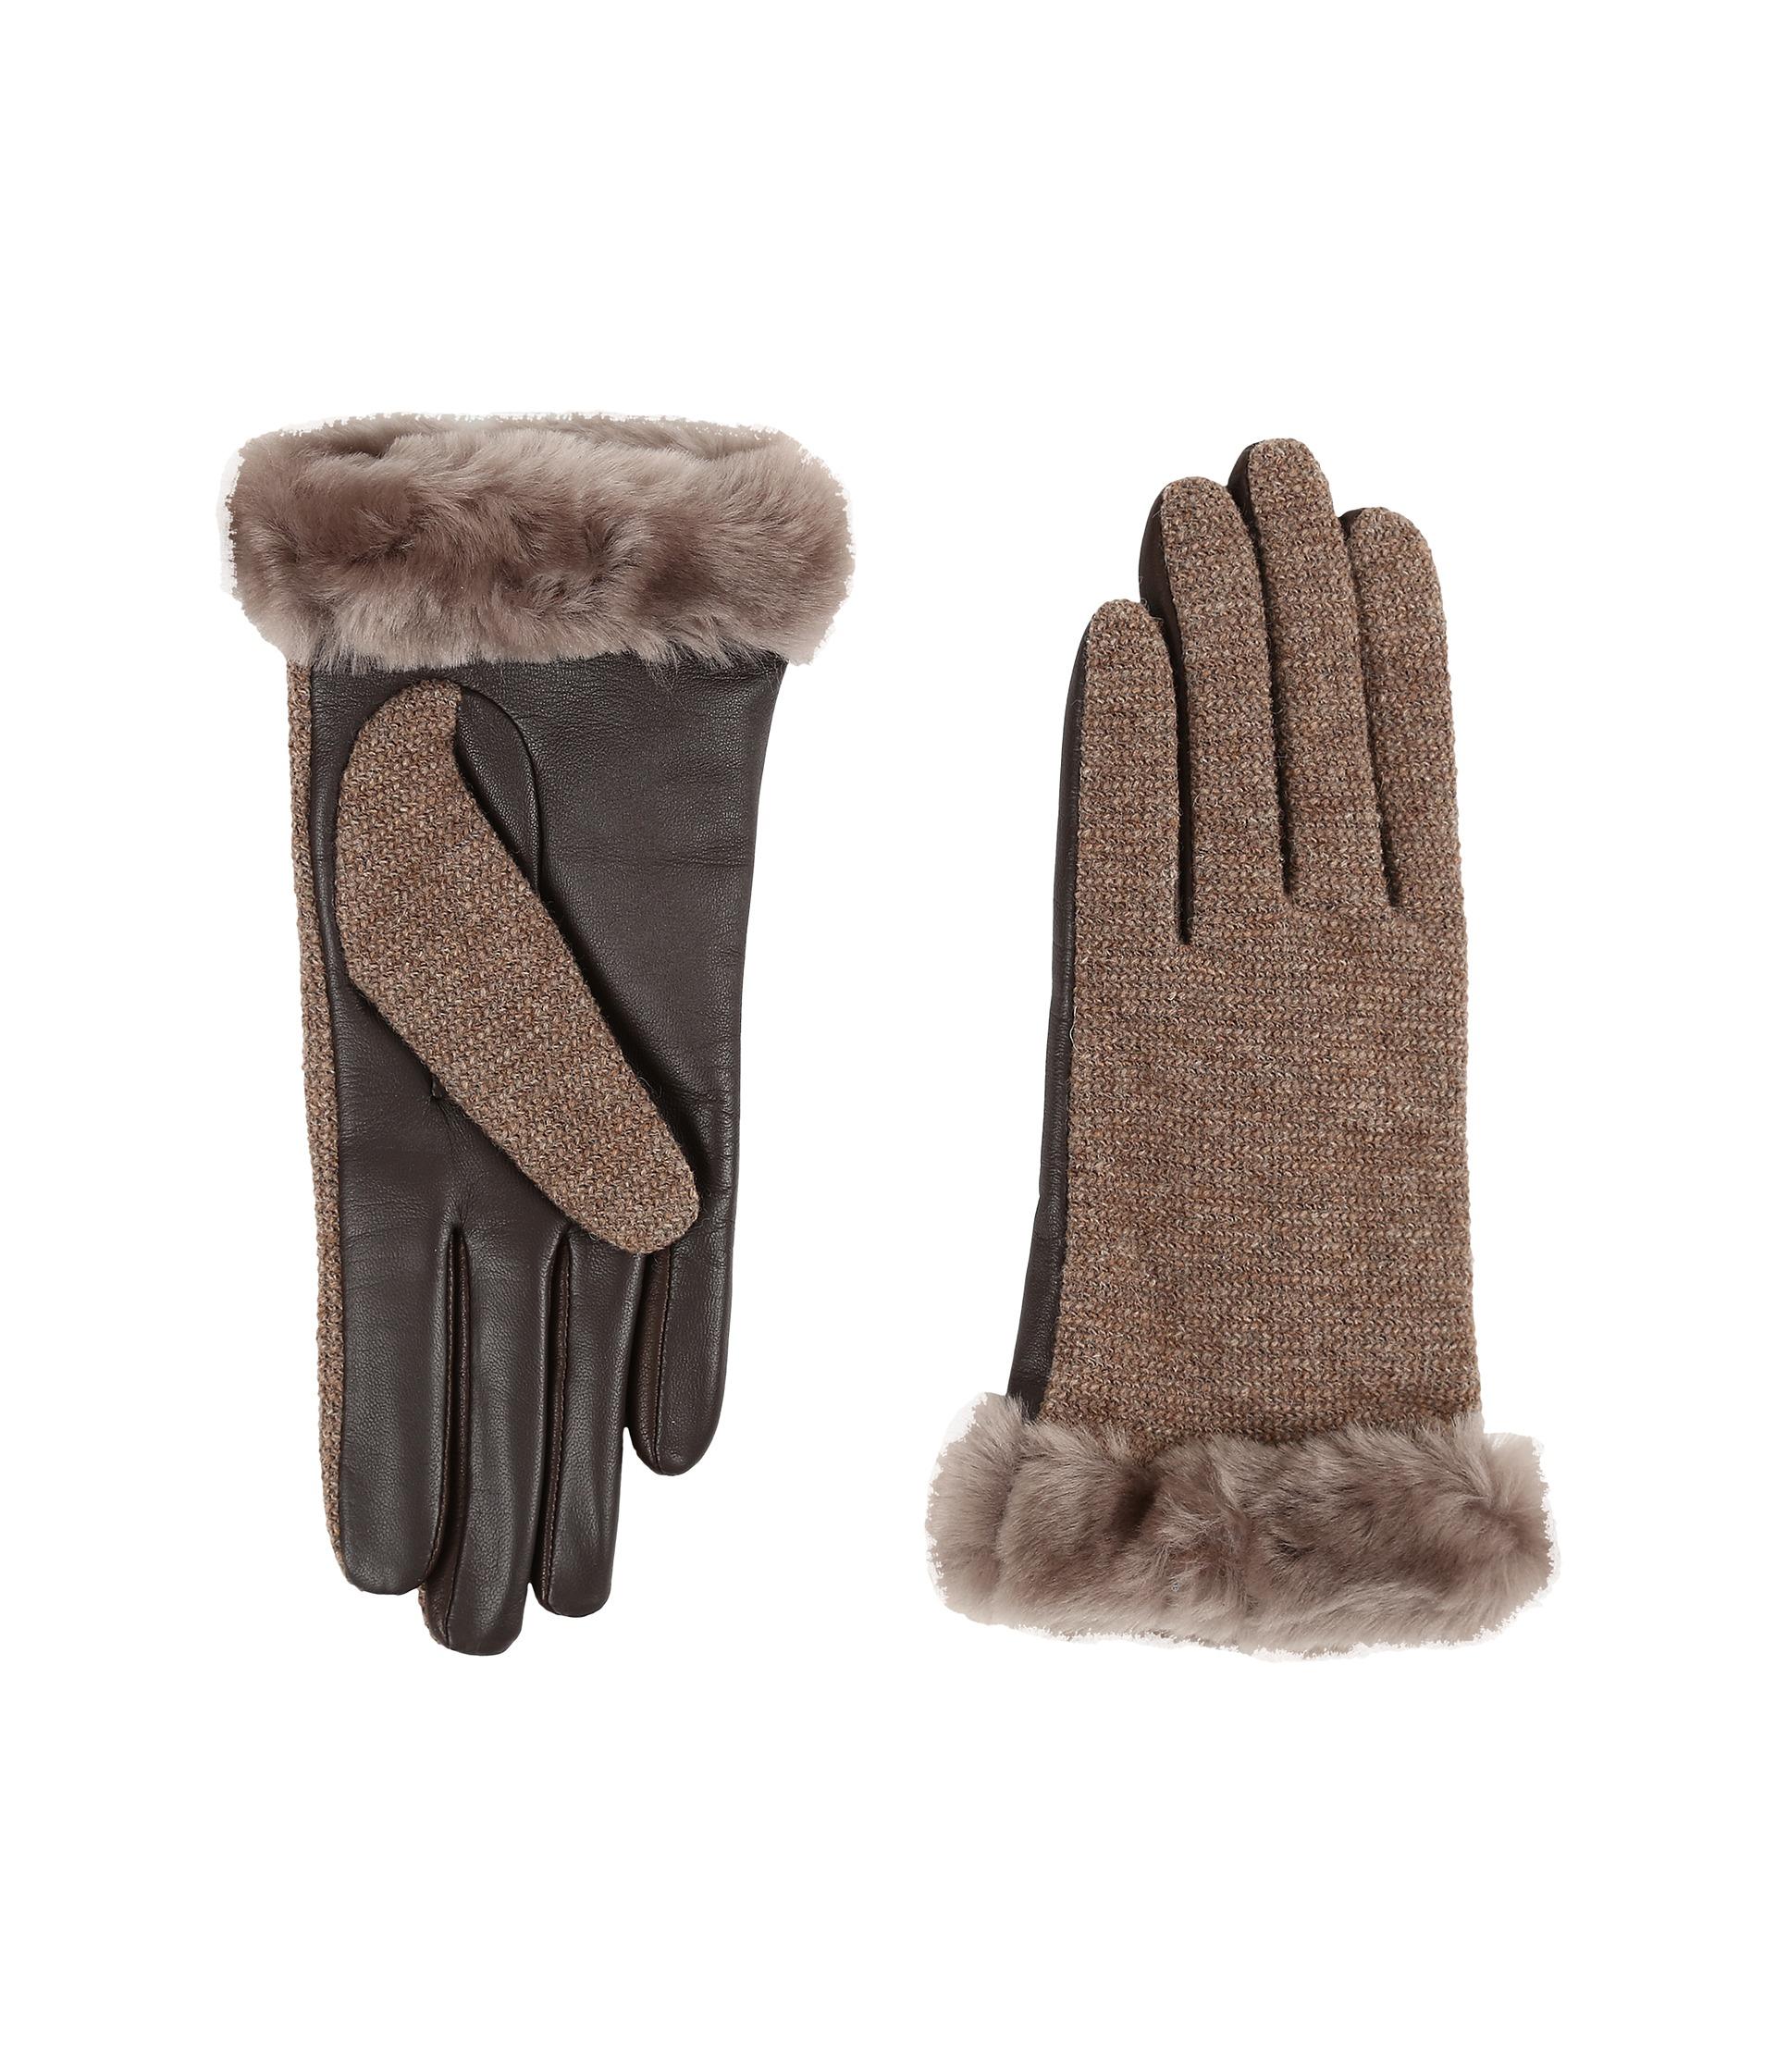 ca0a8c2ae92 Women's Brown Shorty Smart Fabric Gloves W/ Short Pile Trim